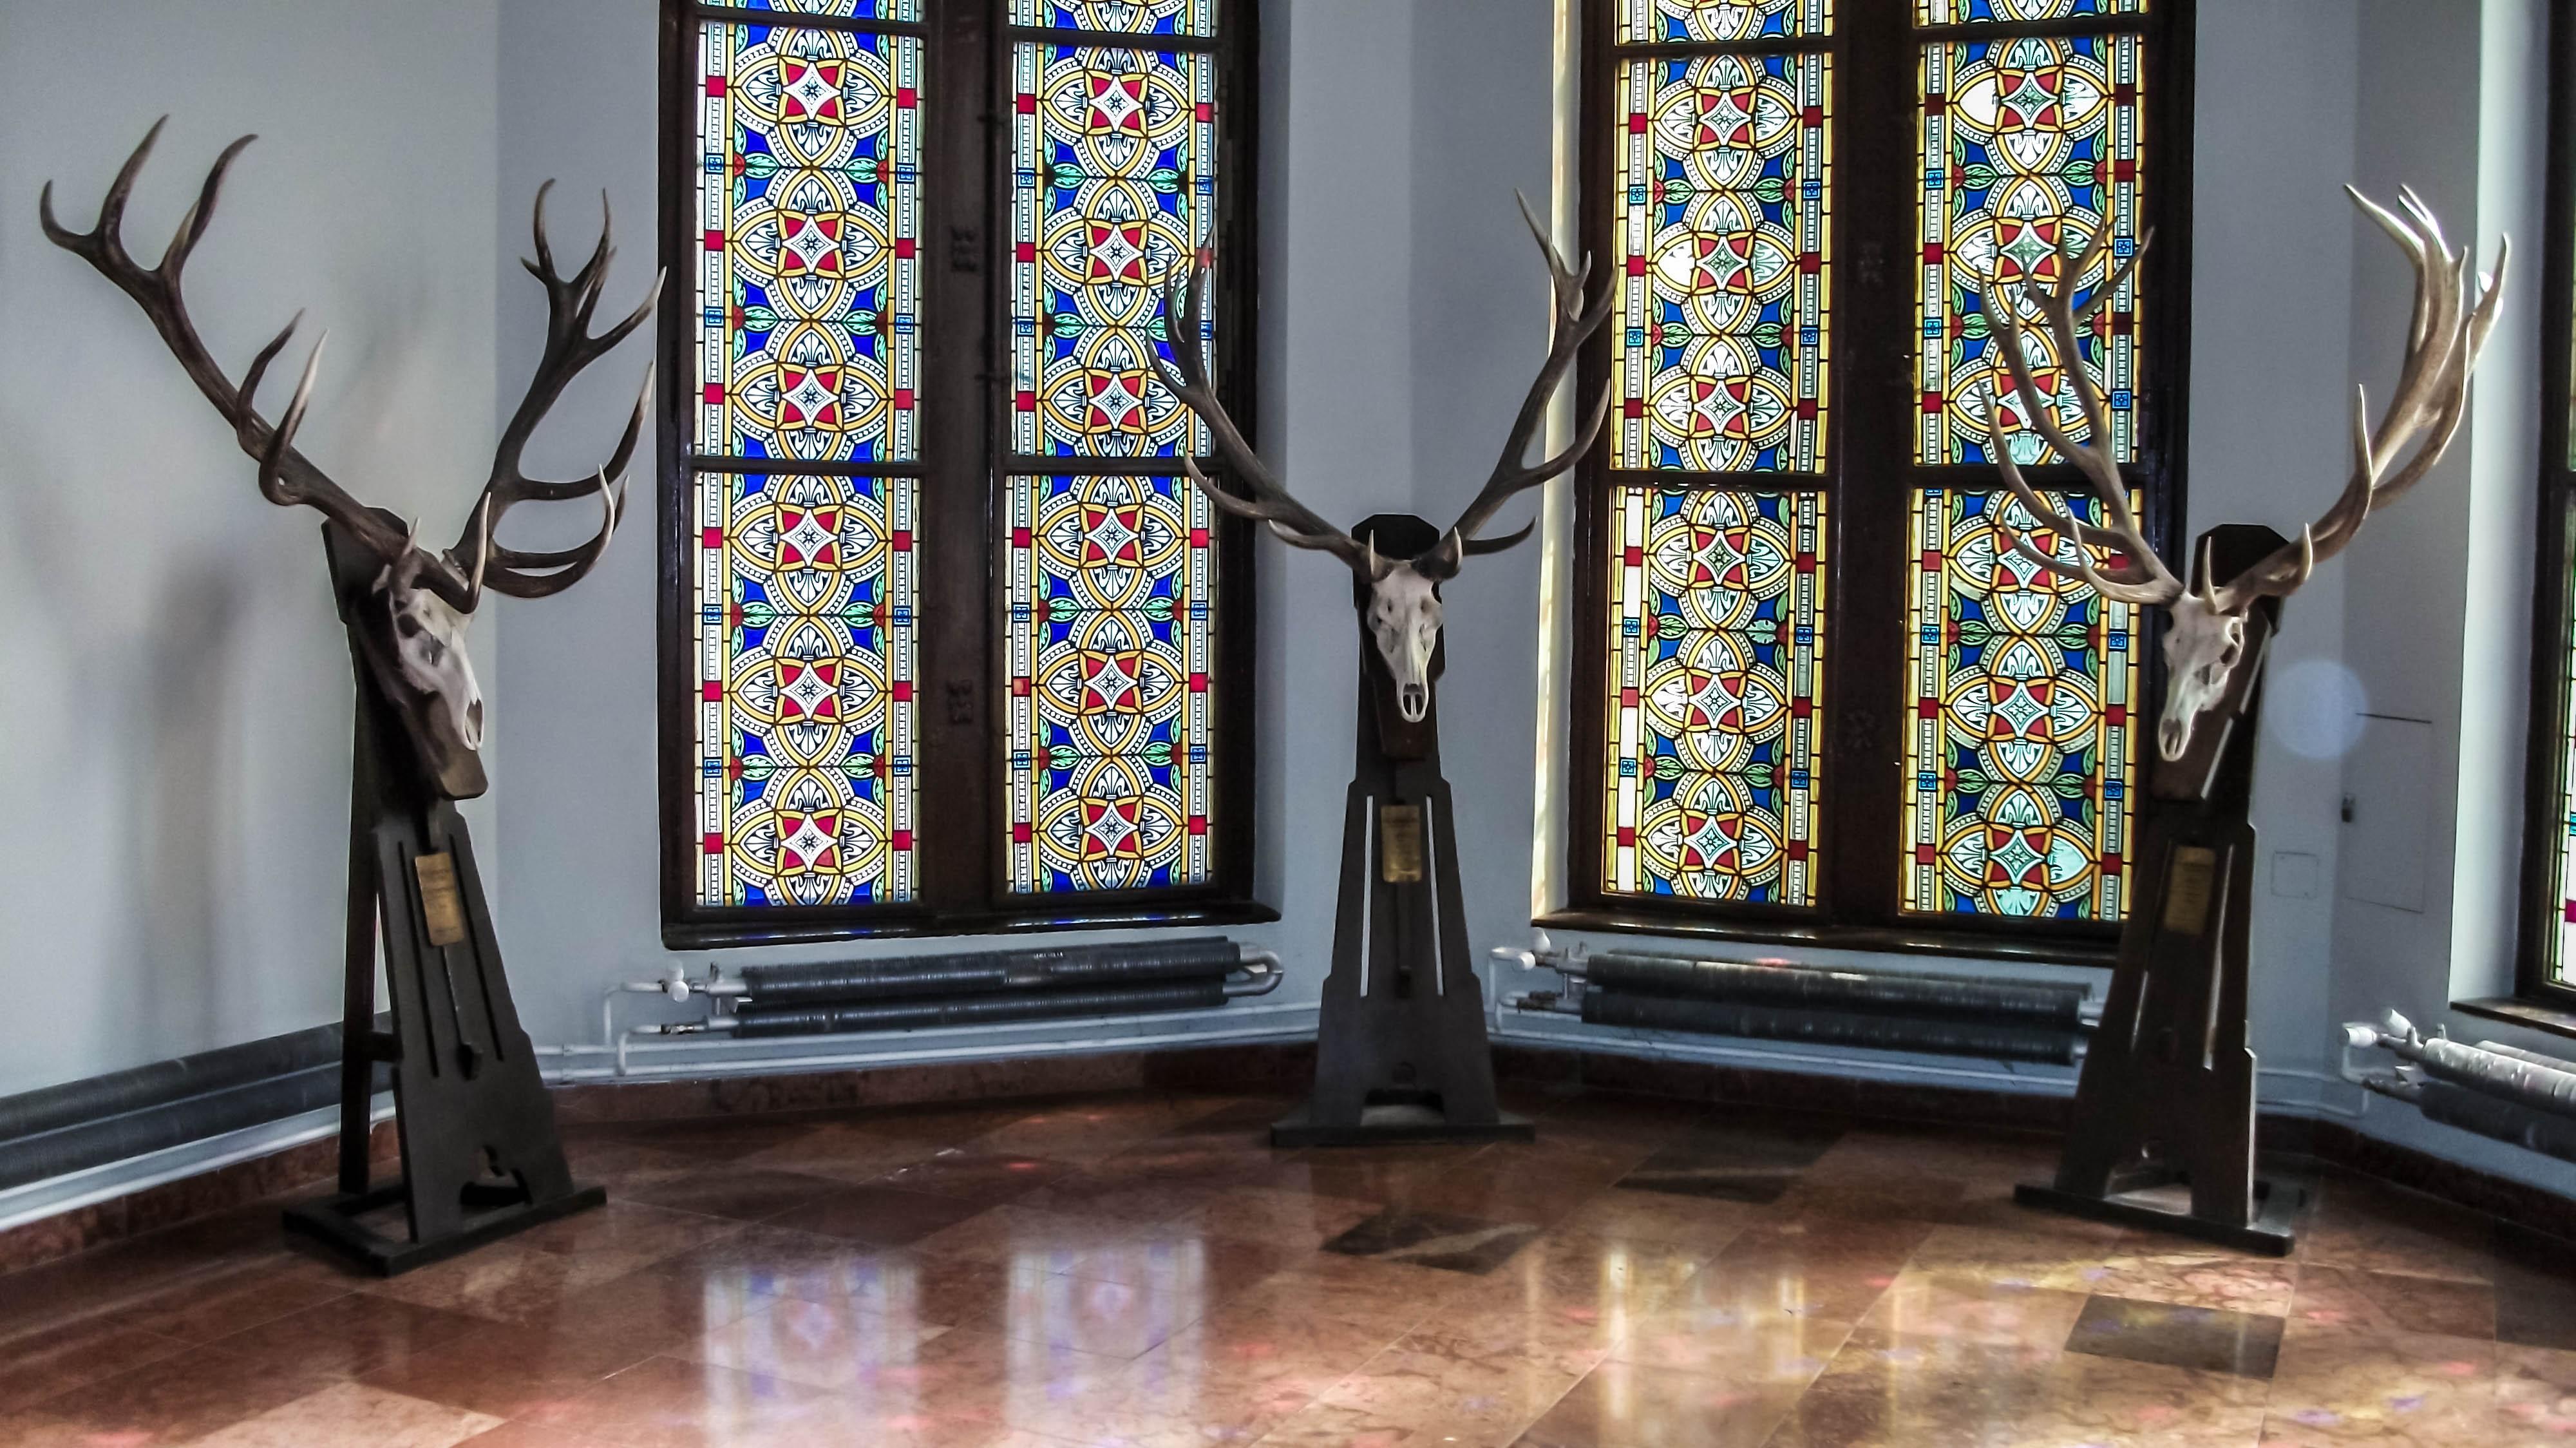 Deer Window Room Glass Curtain Skull Interior Design Stained Glass Antlers  Lighting Material Floor Flooring Living